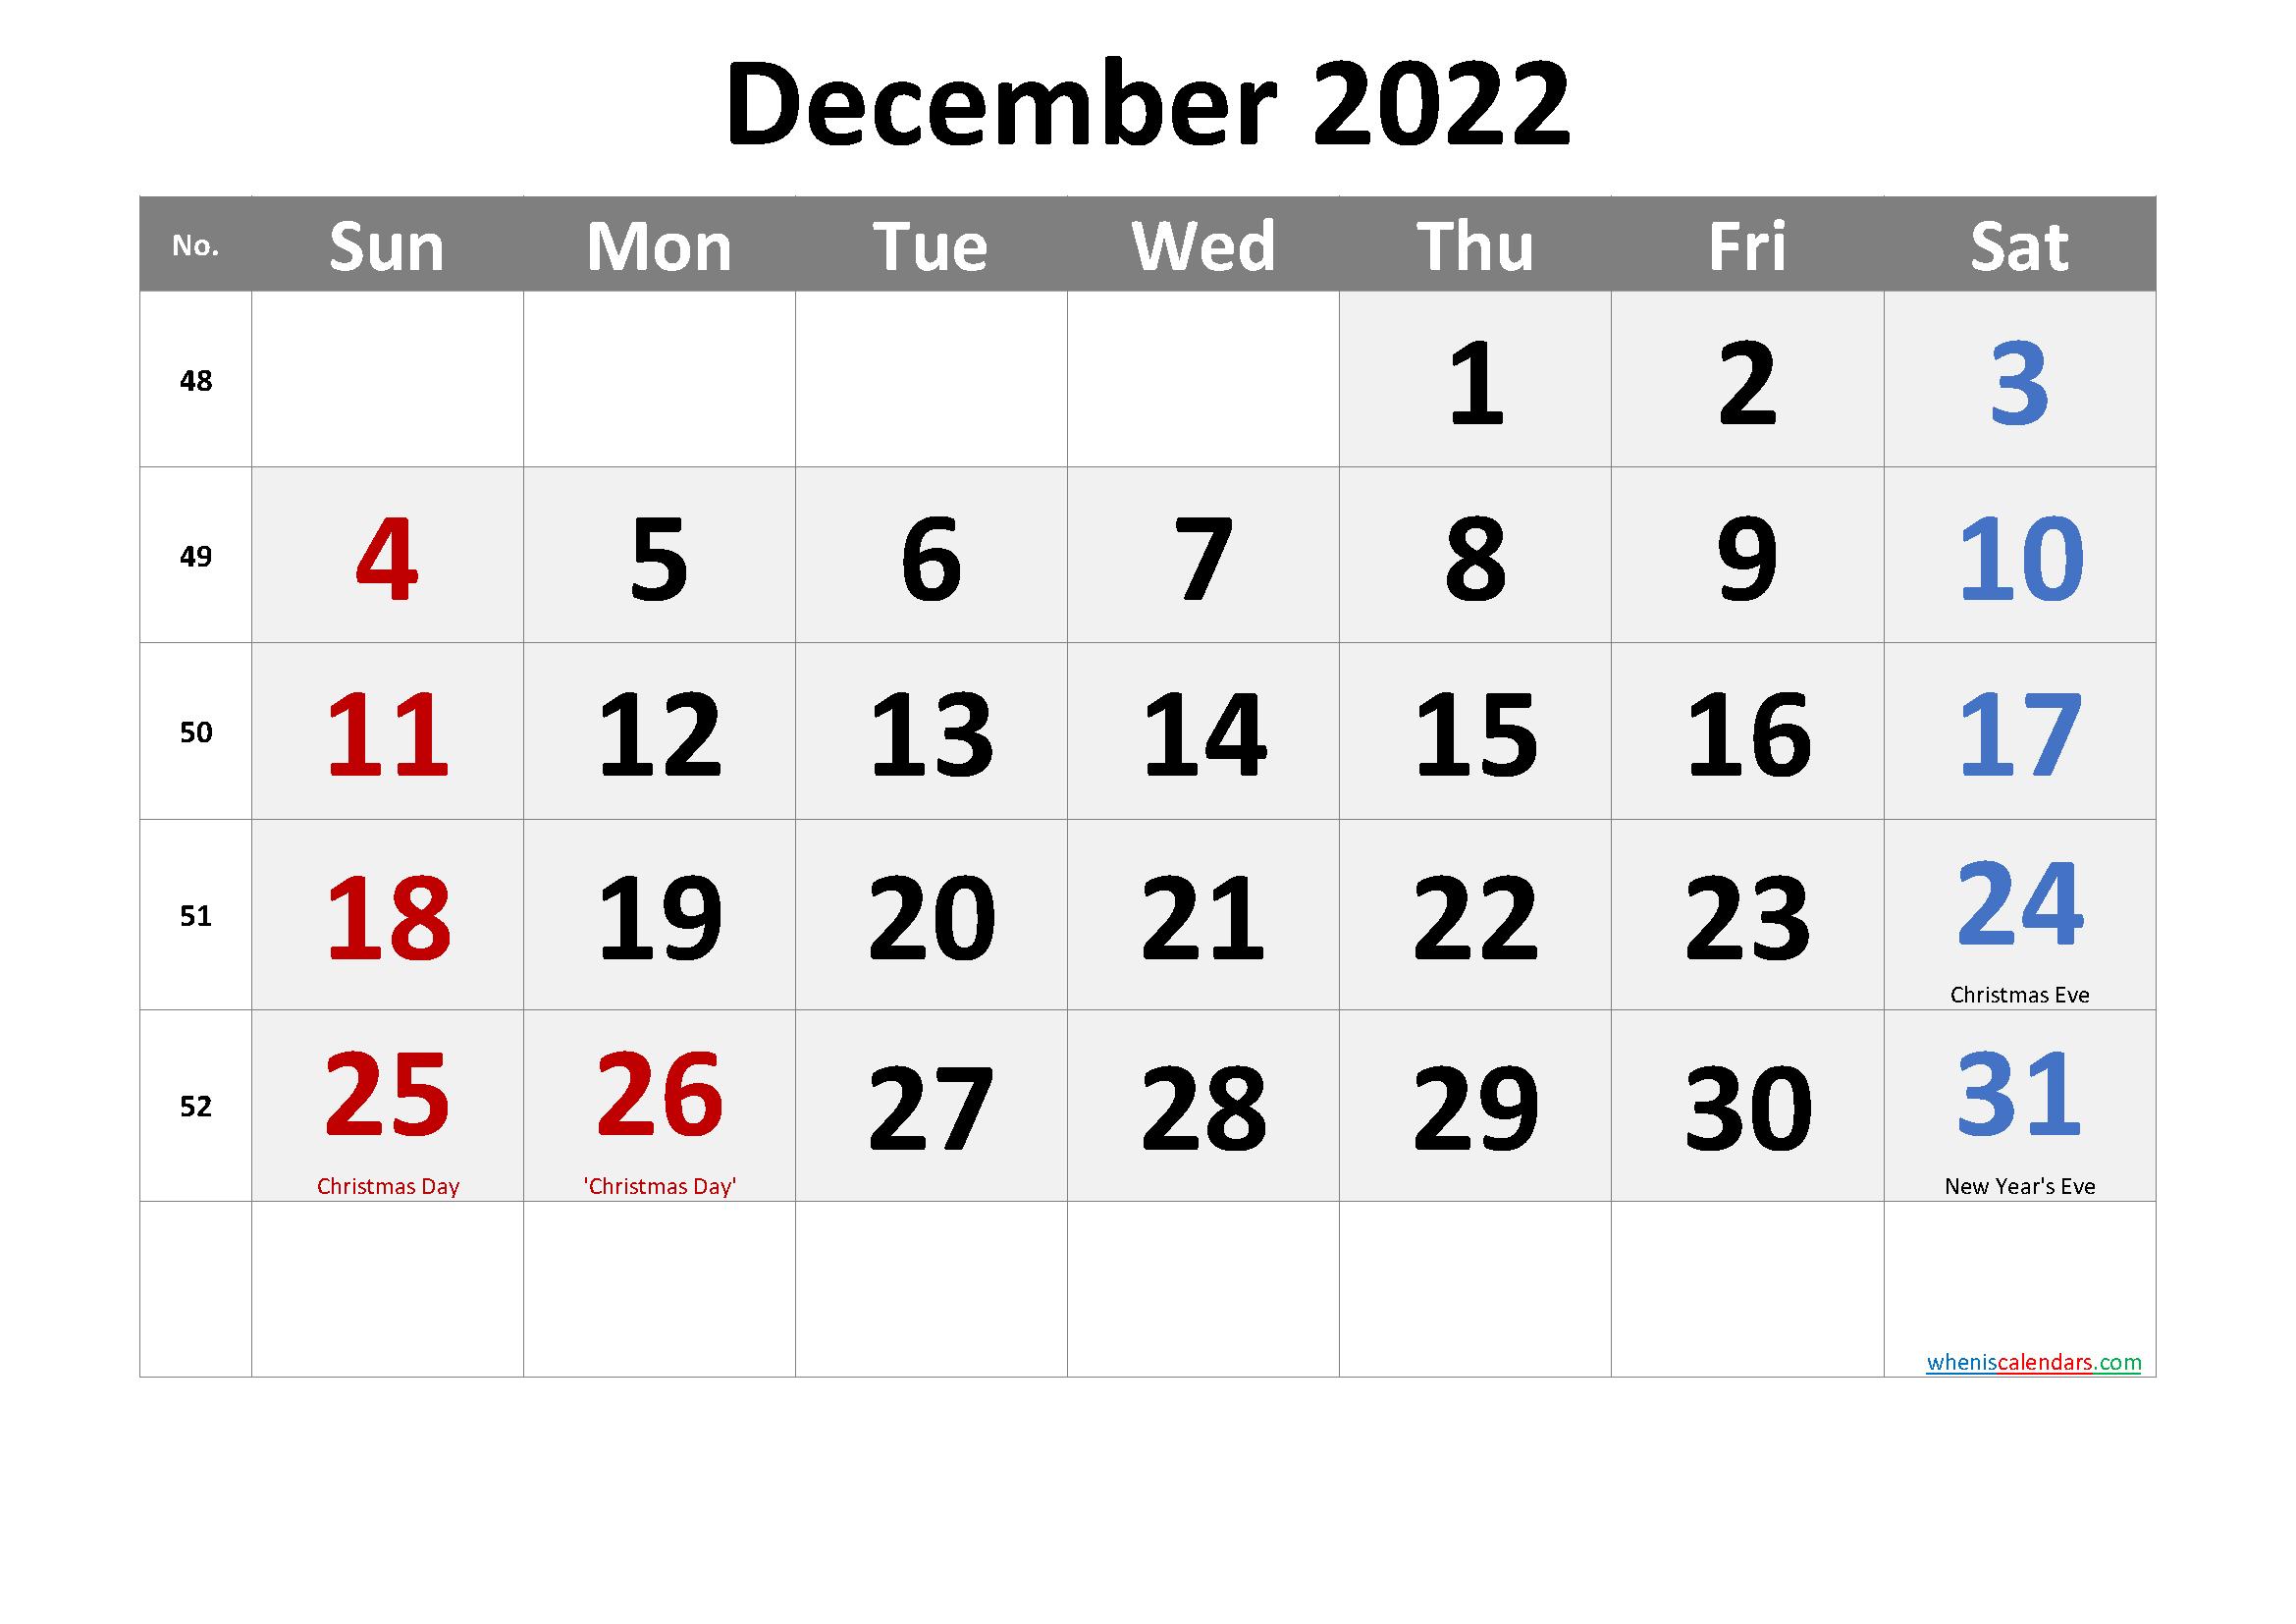 DECEMBER 2022 Printable Calendar with Holidays